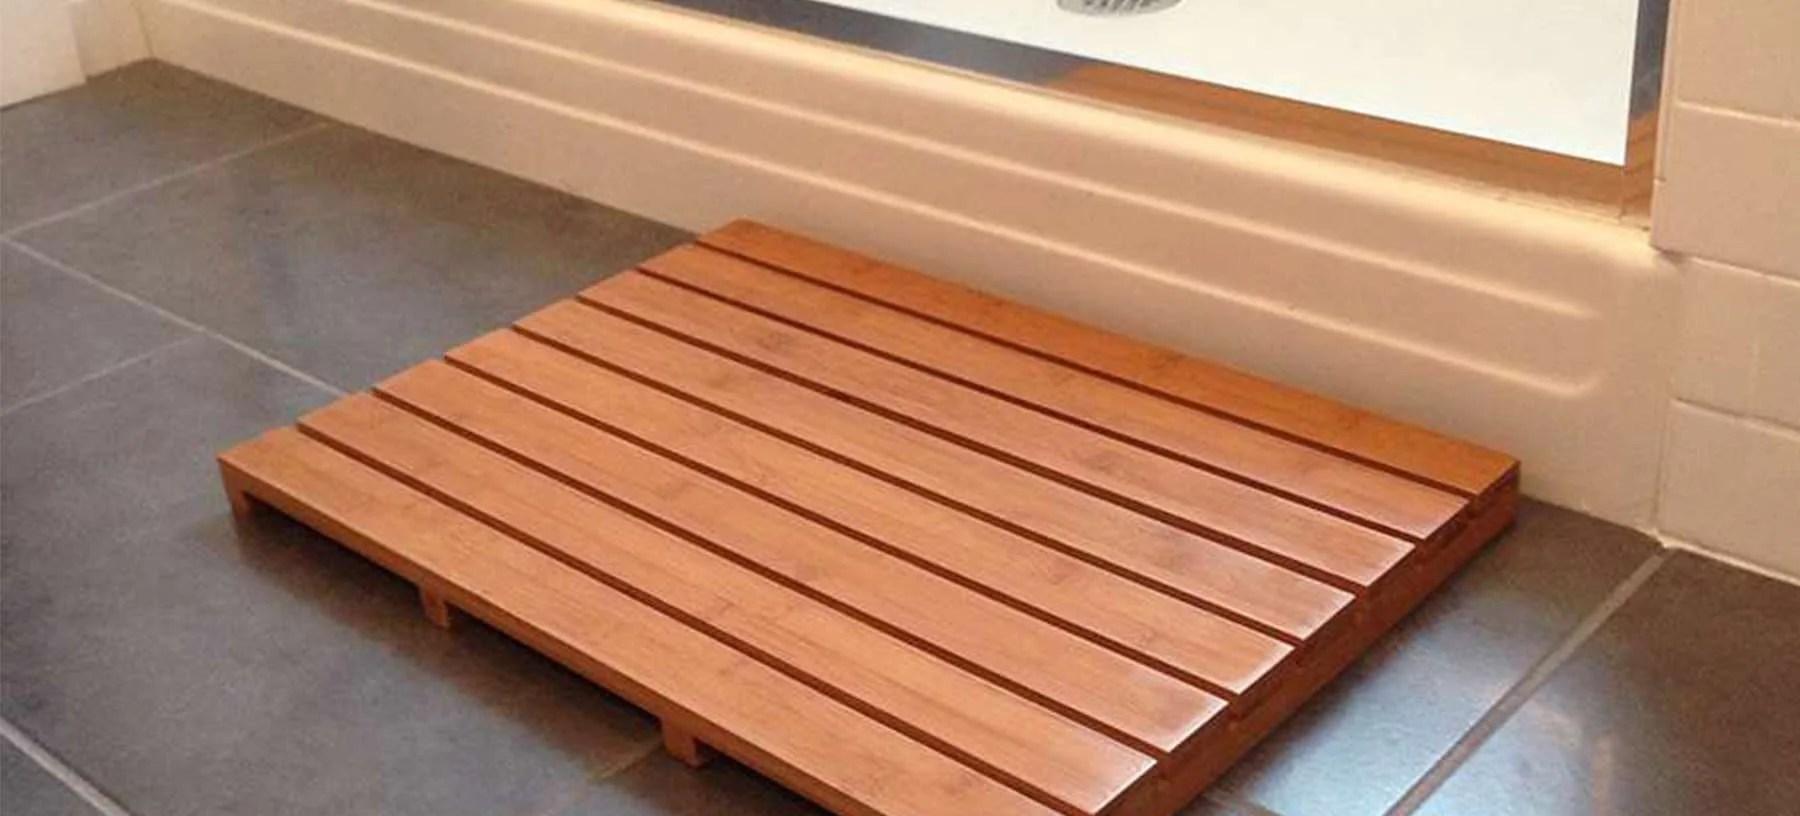 Fullsize Of Bamboo Bath Mat